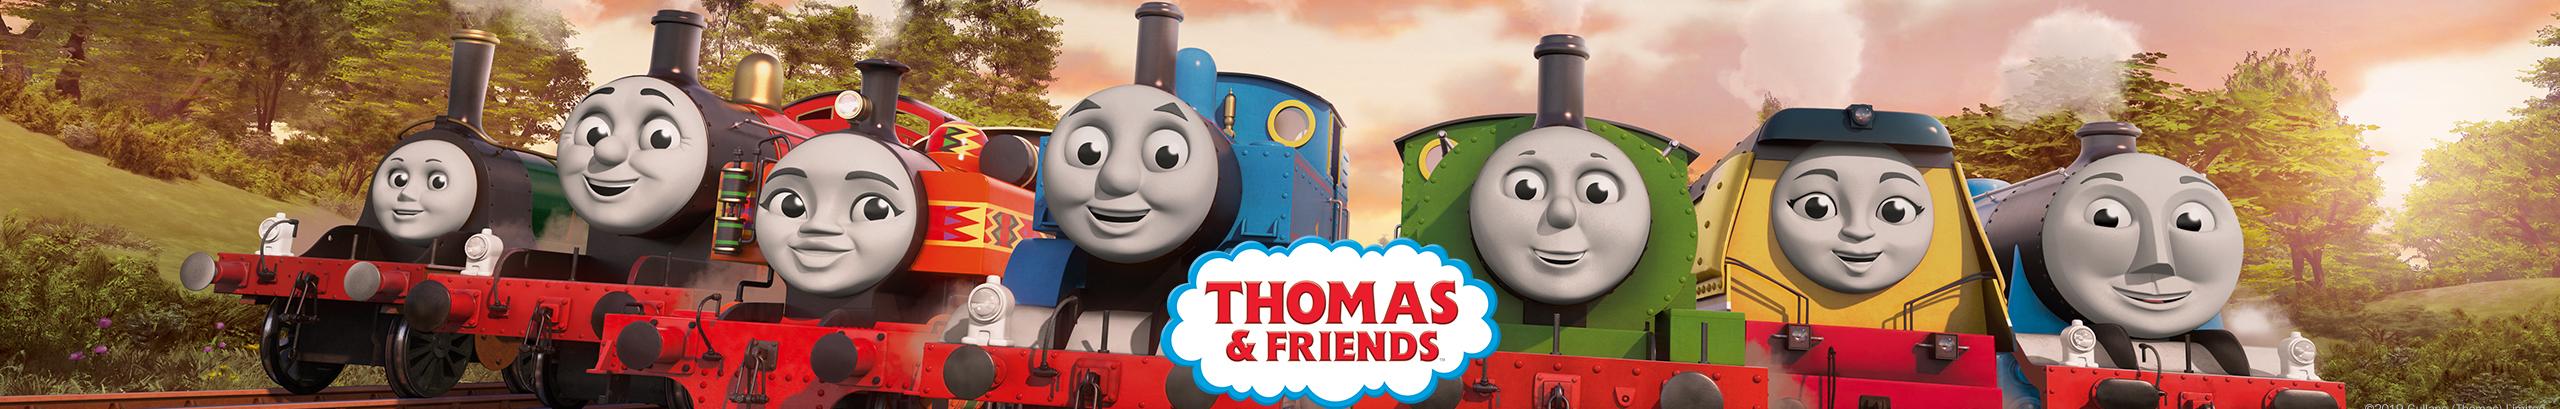 托马斯和朋友 banner